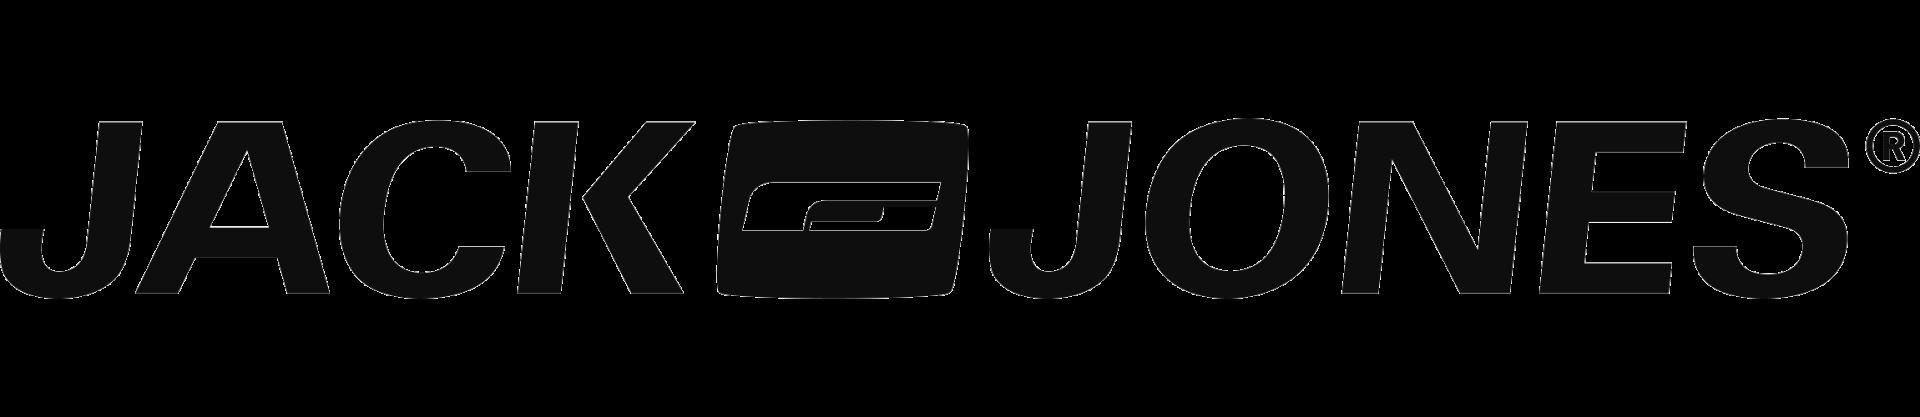 Halonen muoti Jack & Jones Junior uutuudet